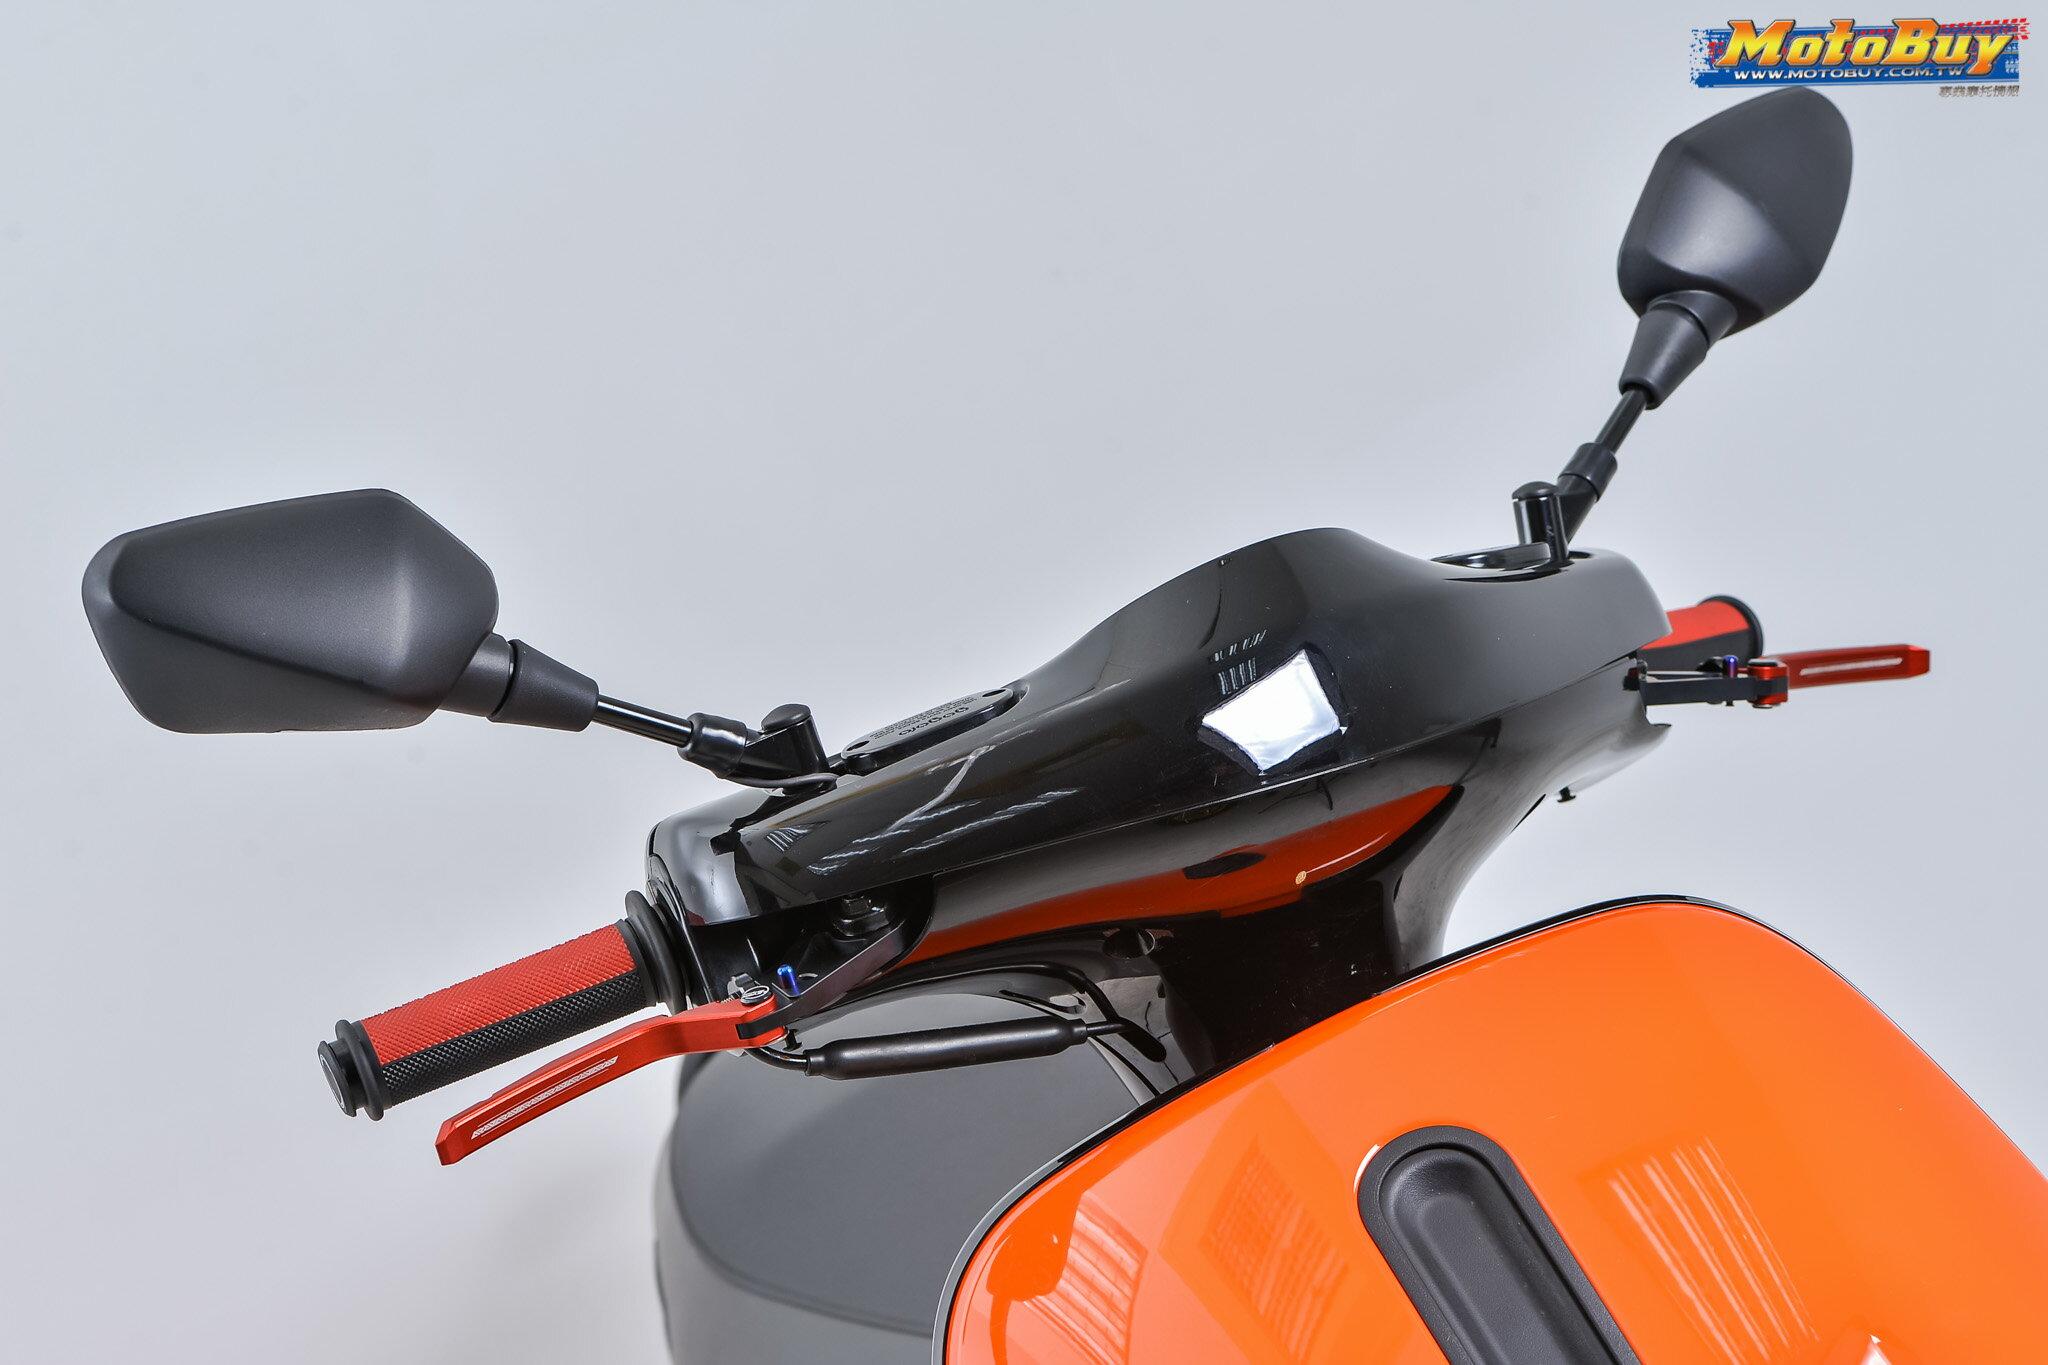 【LFM】APEXX GOGORO2 EC05 EC-05 可調式拉桿 煞車拉桿 剎車拉桿 附手剎車 鍍鈦柱 LEVER